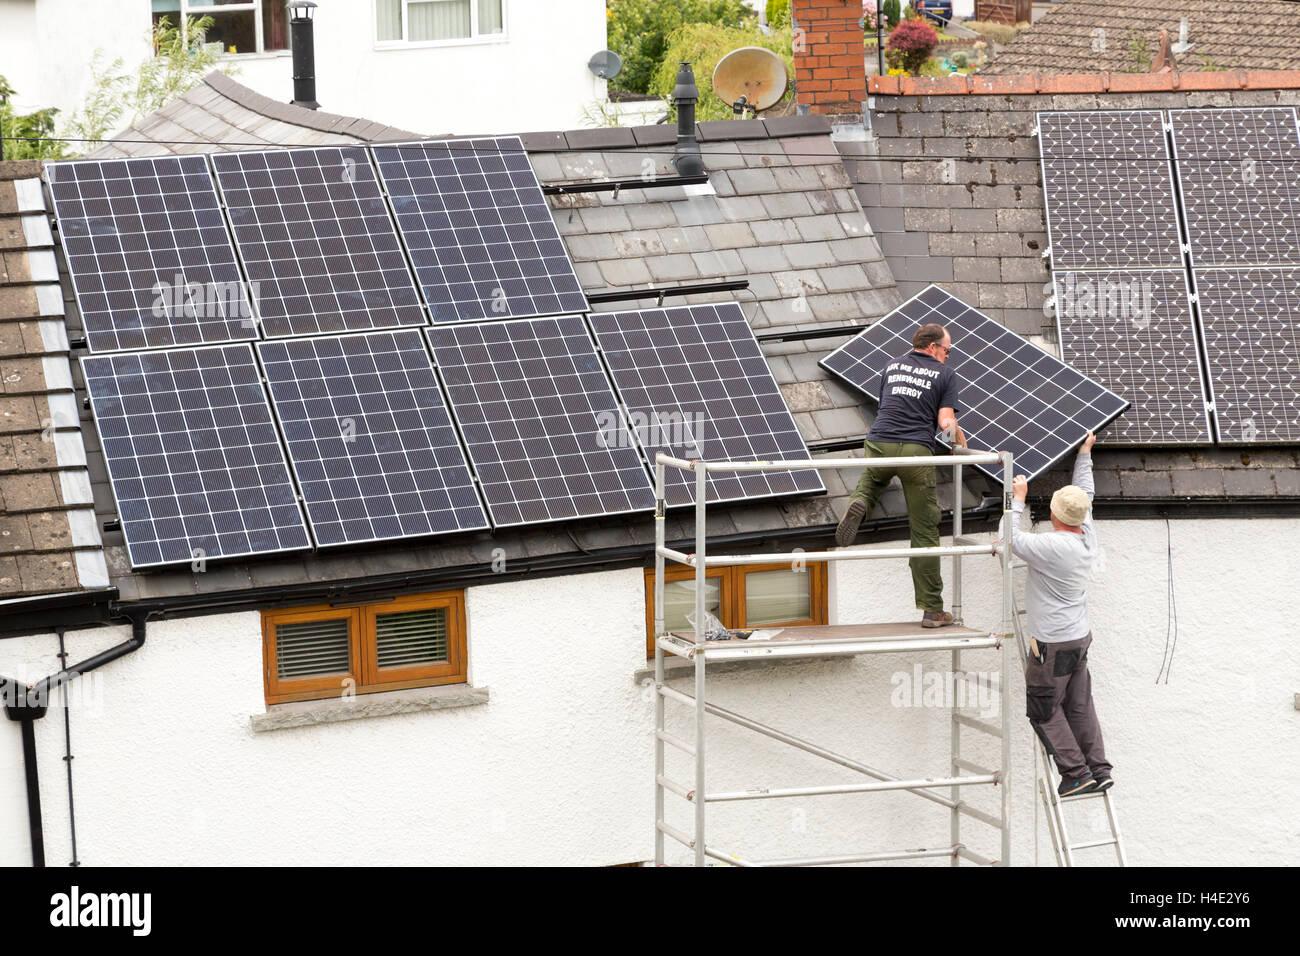 Solar panel installation on domestic roof, Llanfoist, Wales, UK - Stock Image